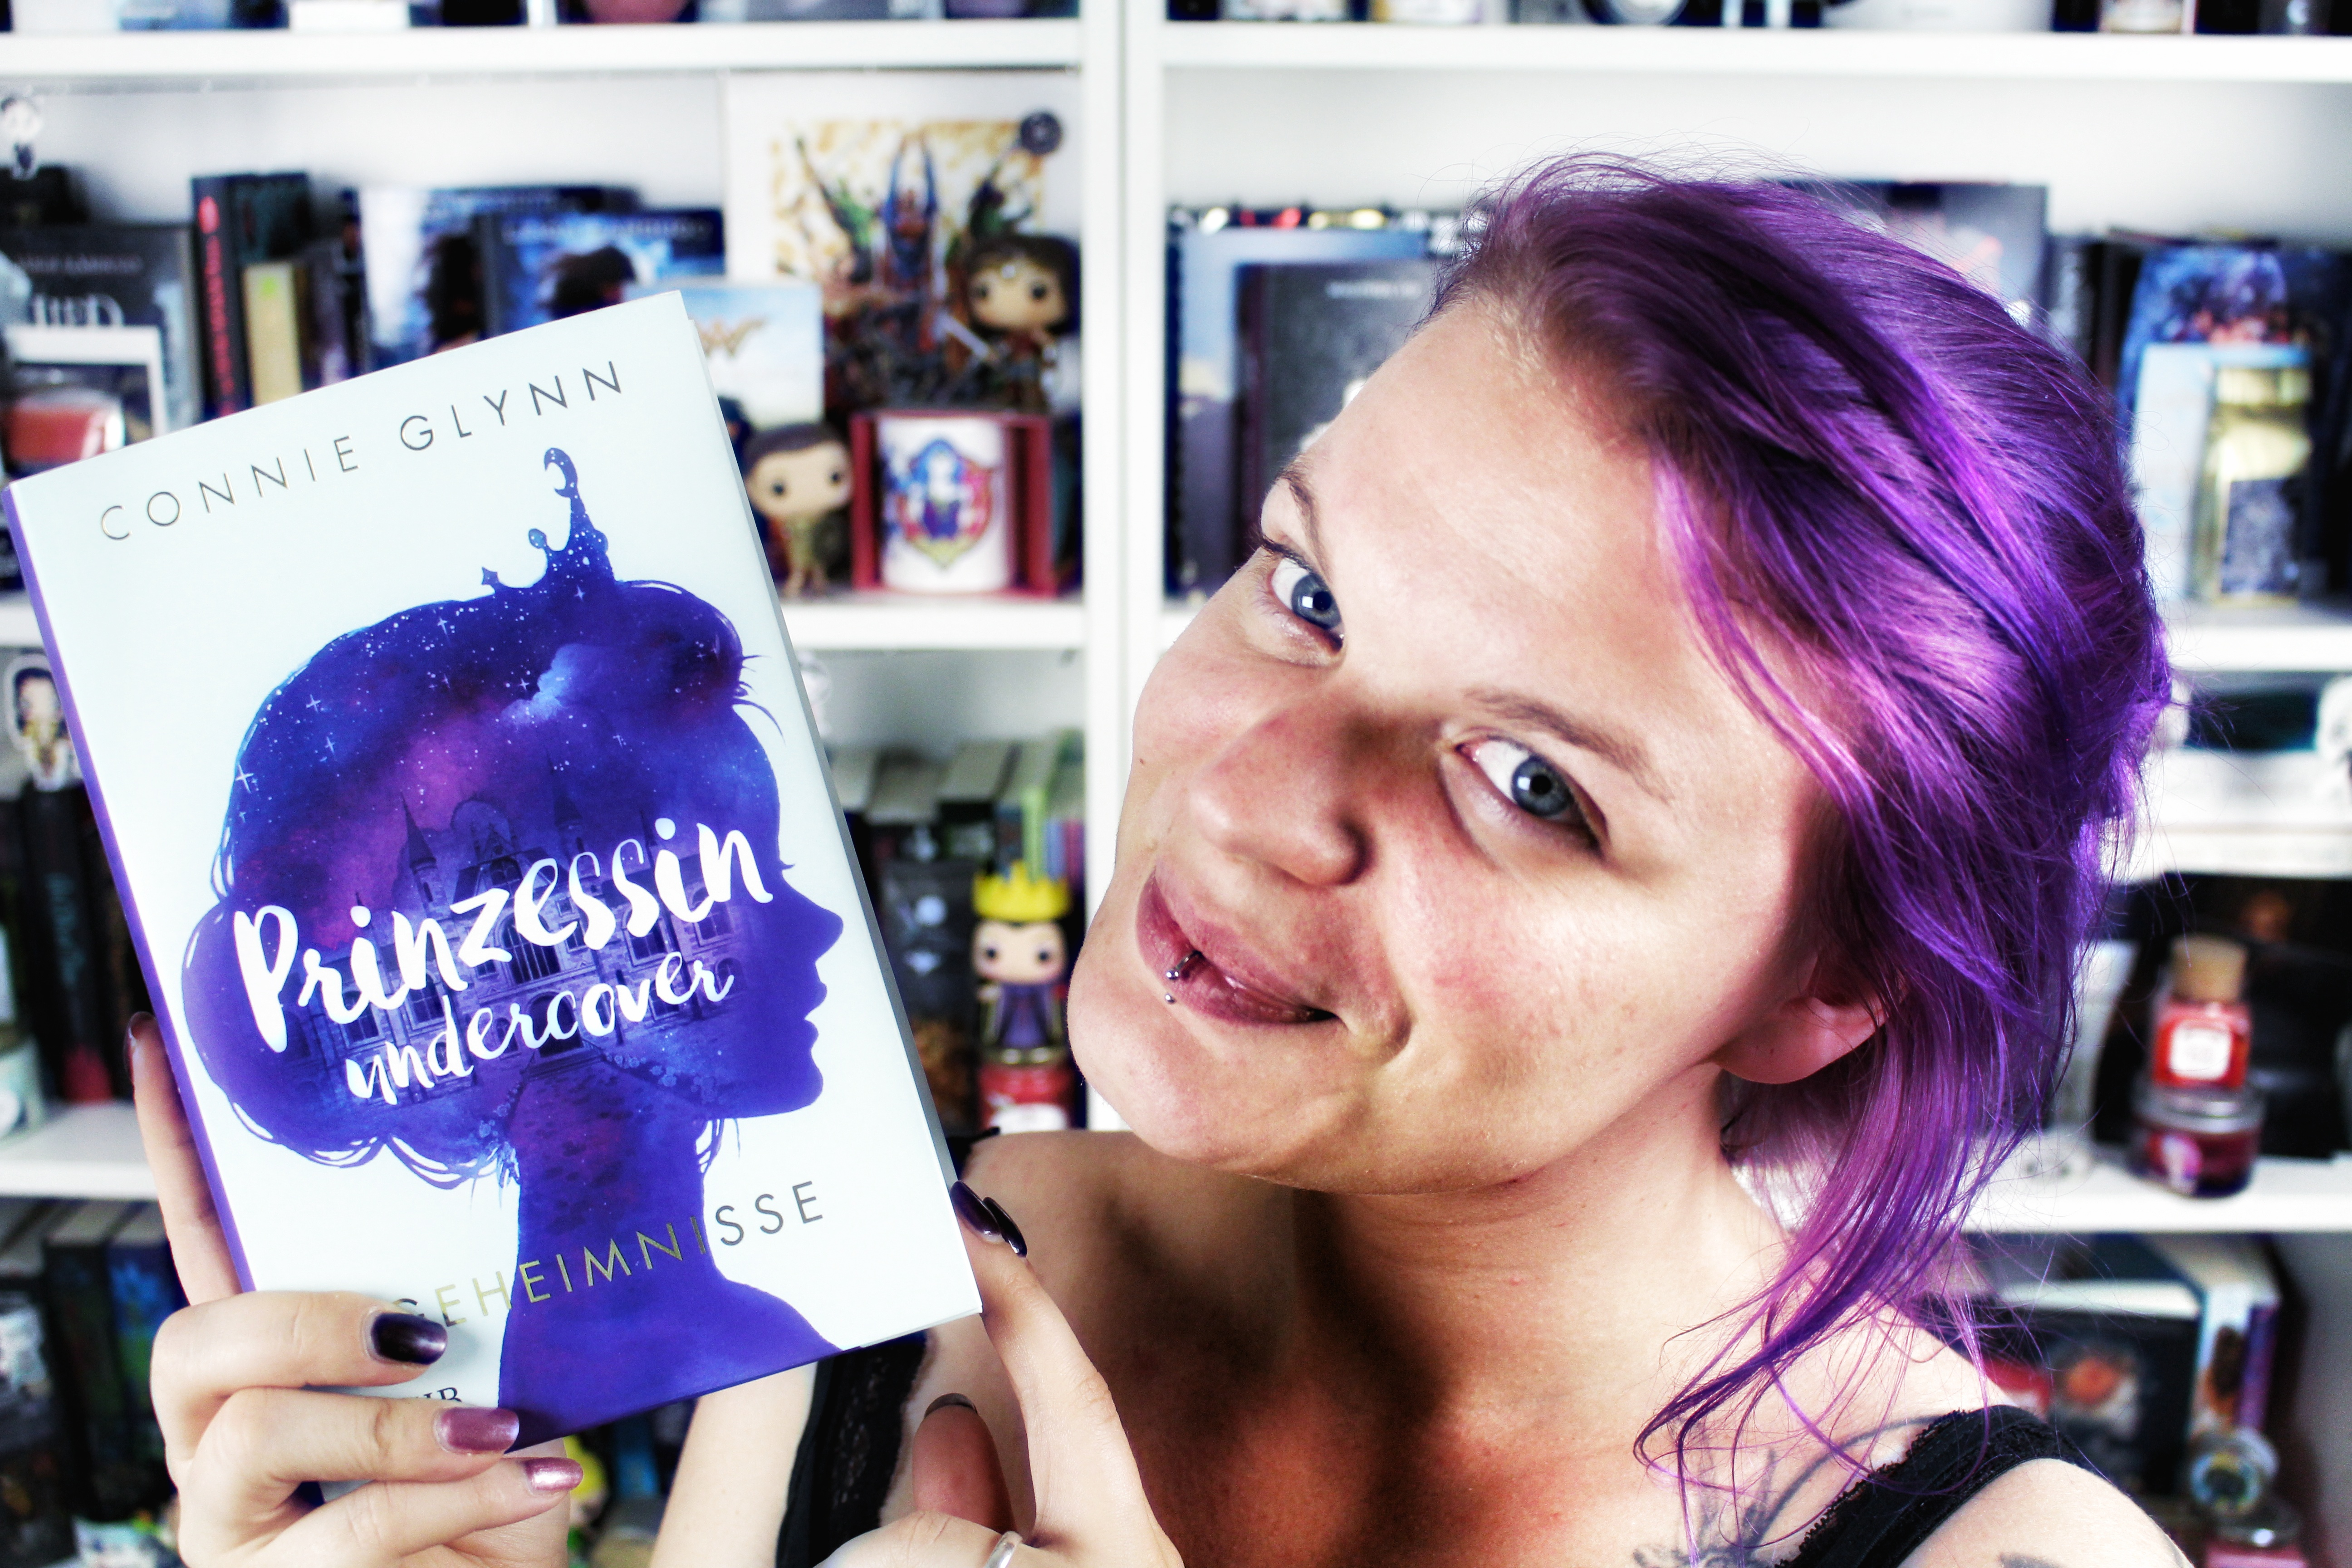 Rezension: Prinzessin Undercover / Connie Glynn